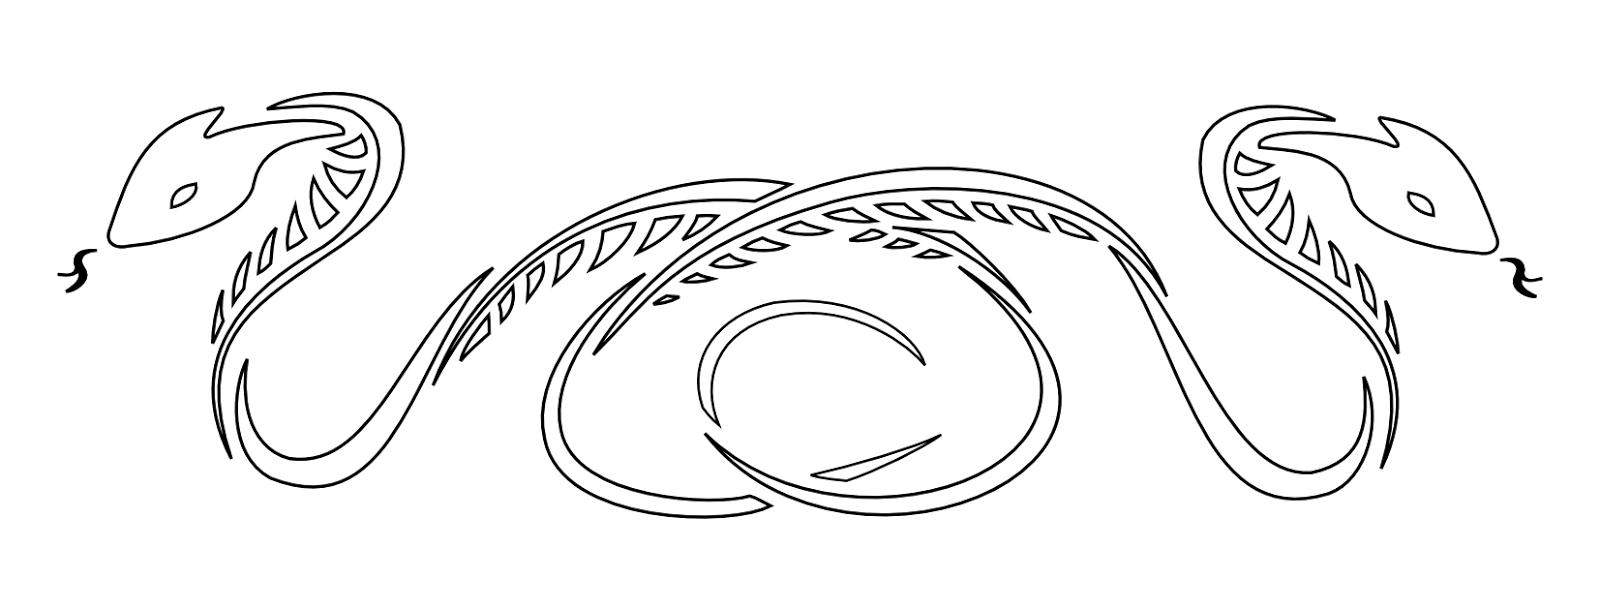 Snakes armband tattoo stencil